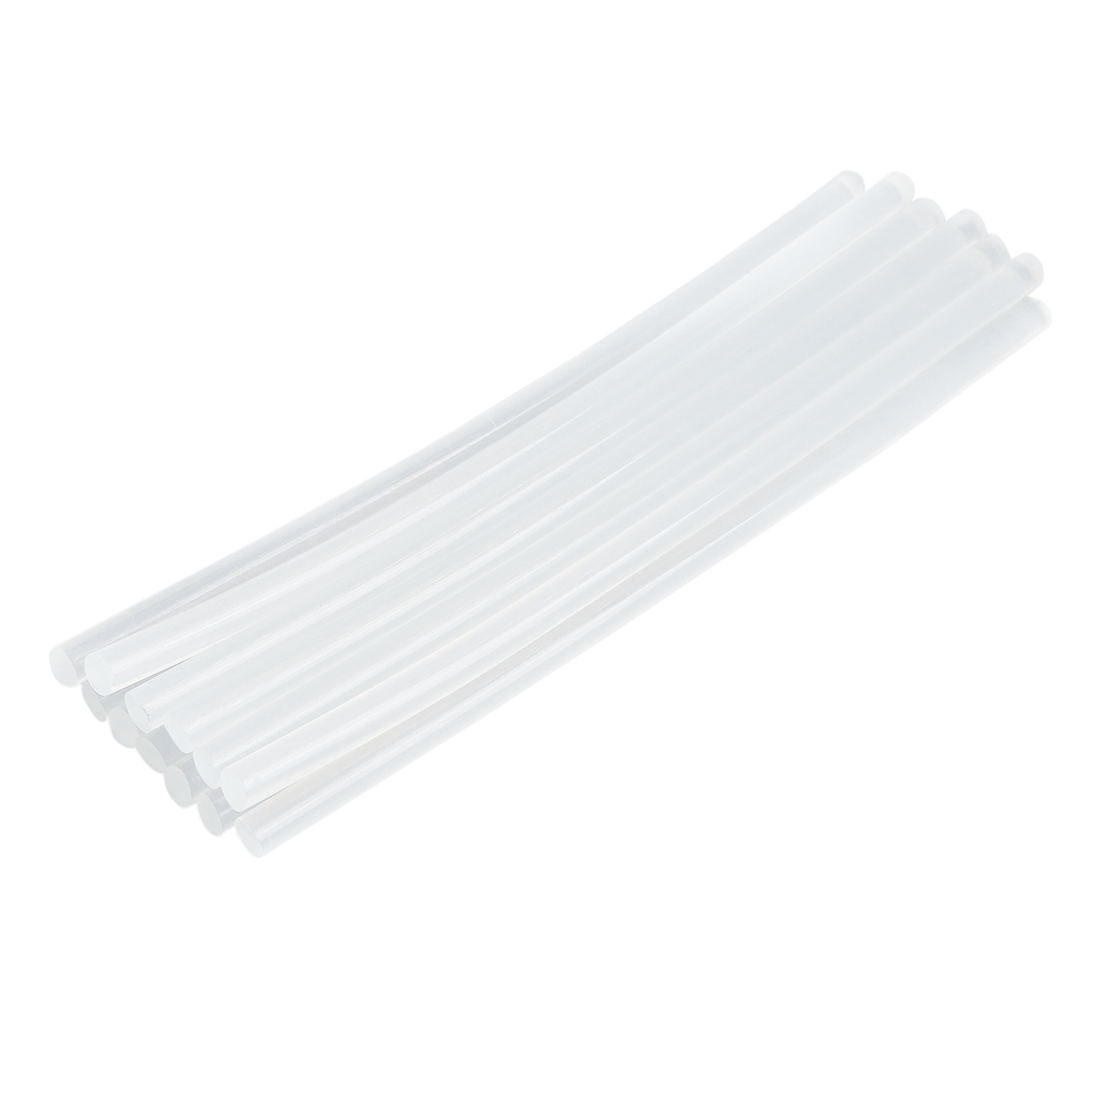 12 Pcs 7mm x 200mm Clear Paintless Dent Repair Hot Melt Glue Sticks for Car